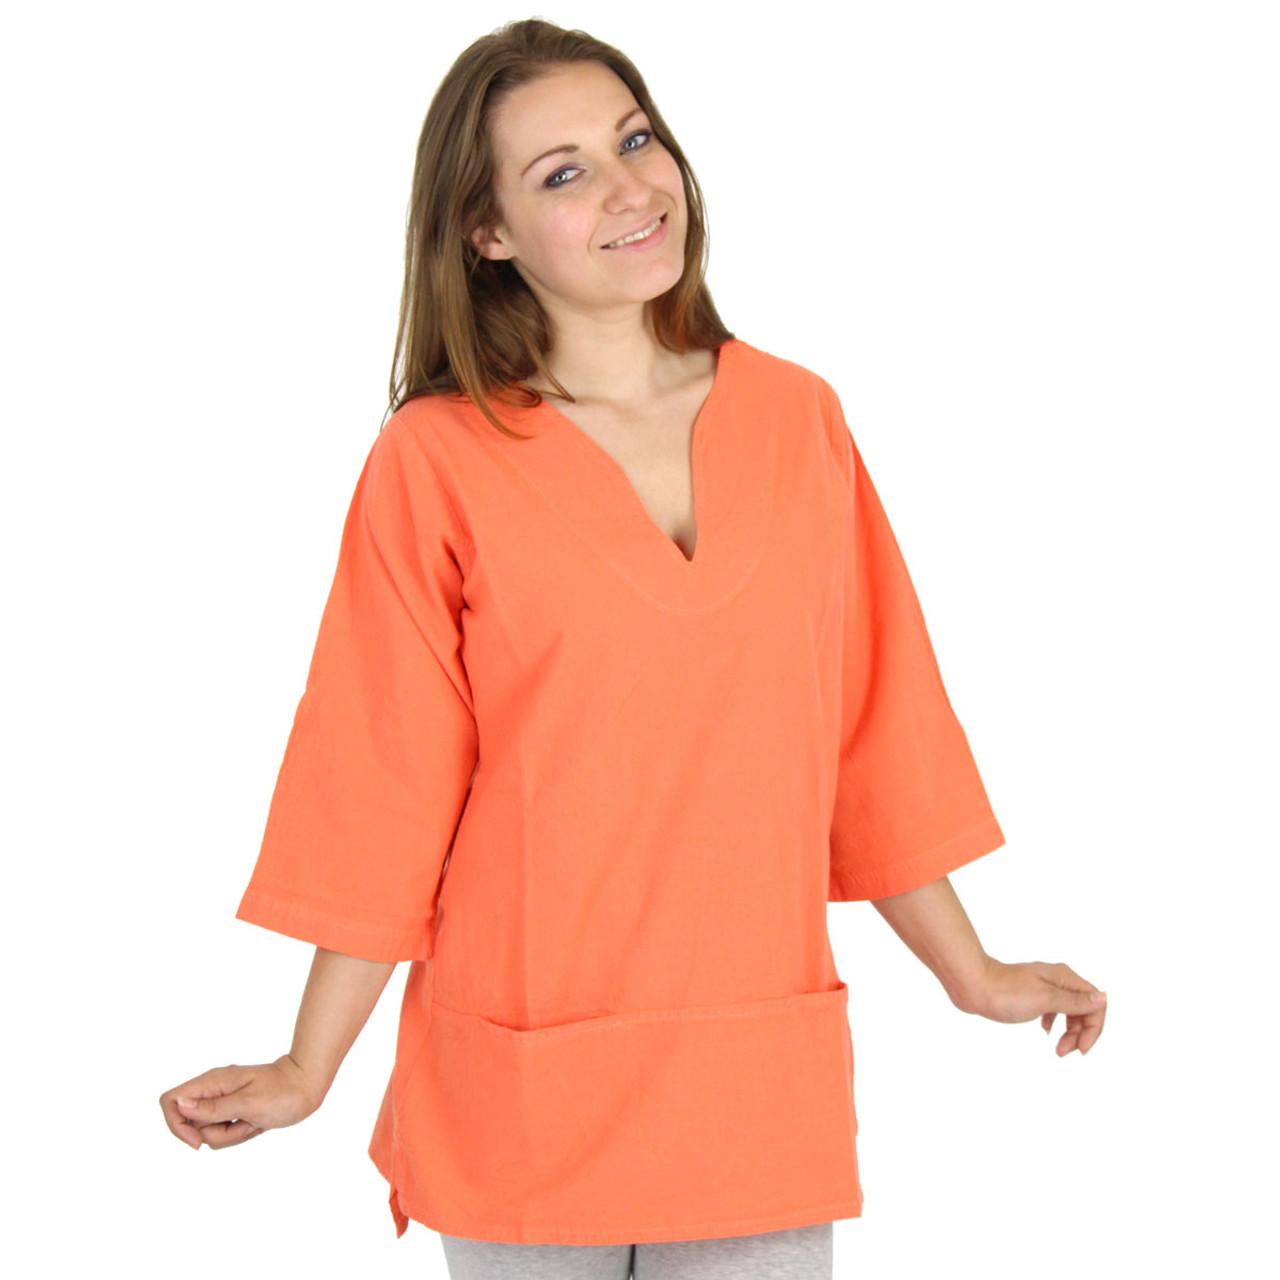 6387027eb Cotton Tunic Top / Ezze Wear / Made in Canada